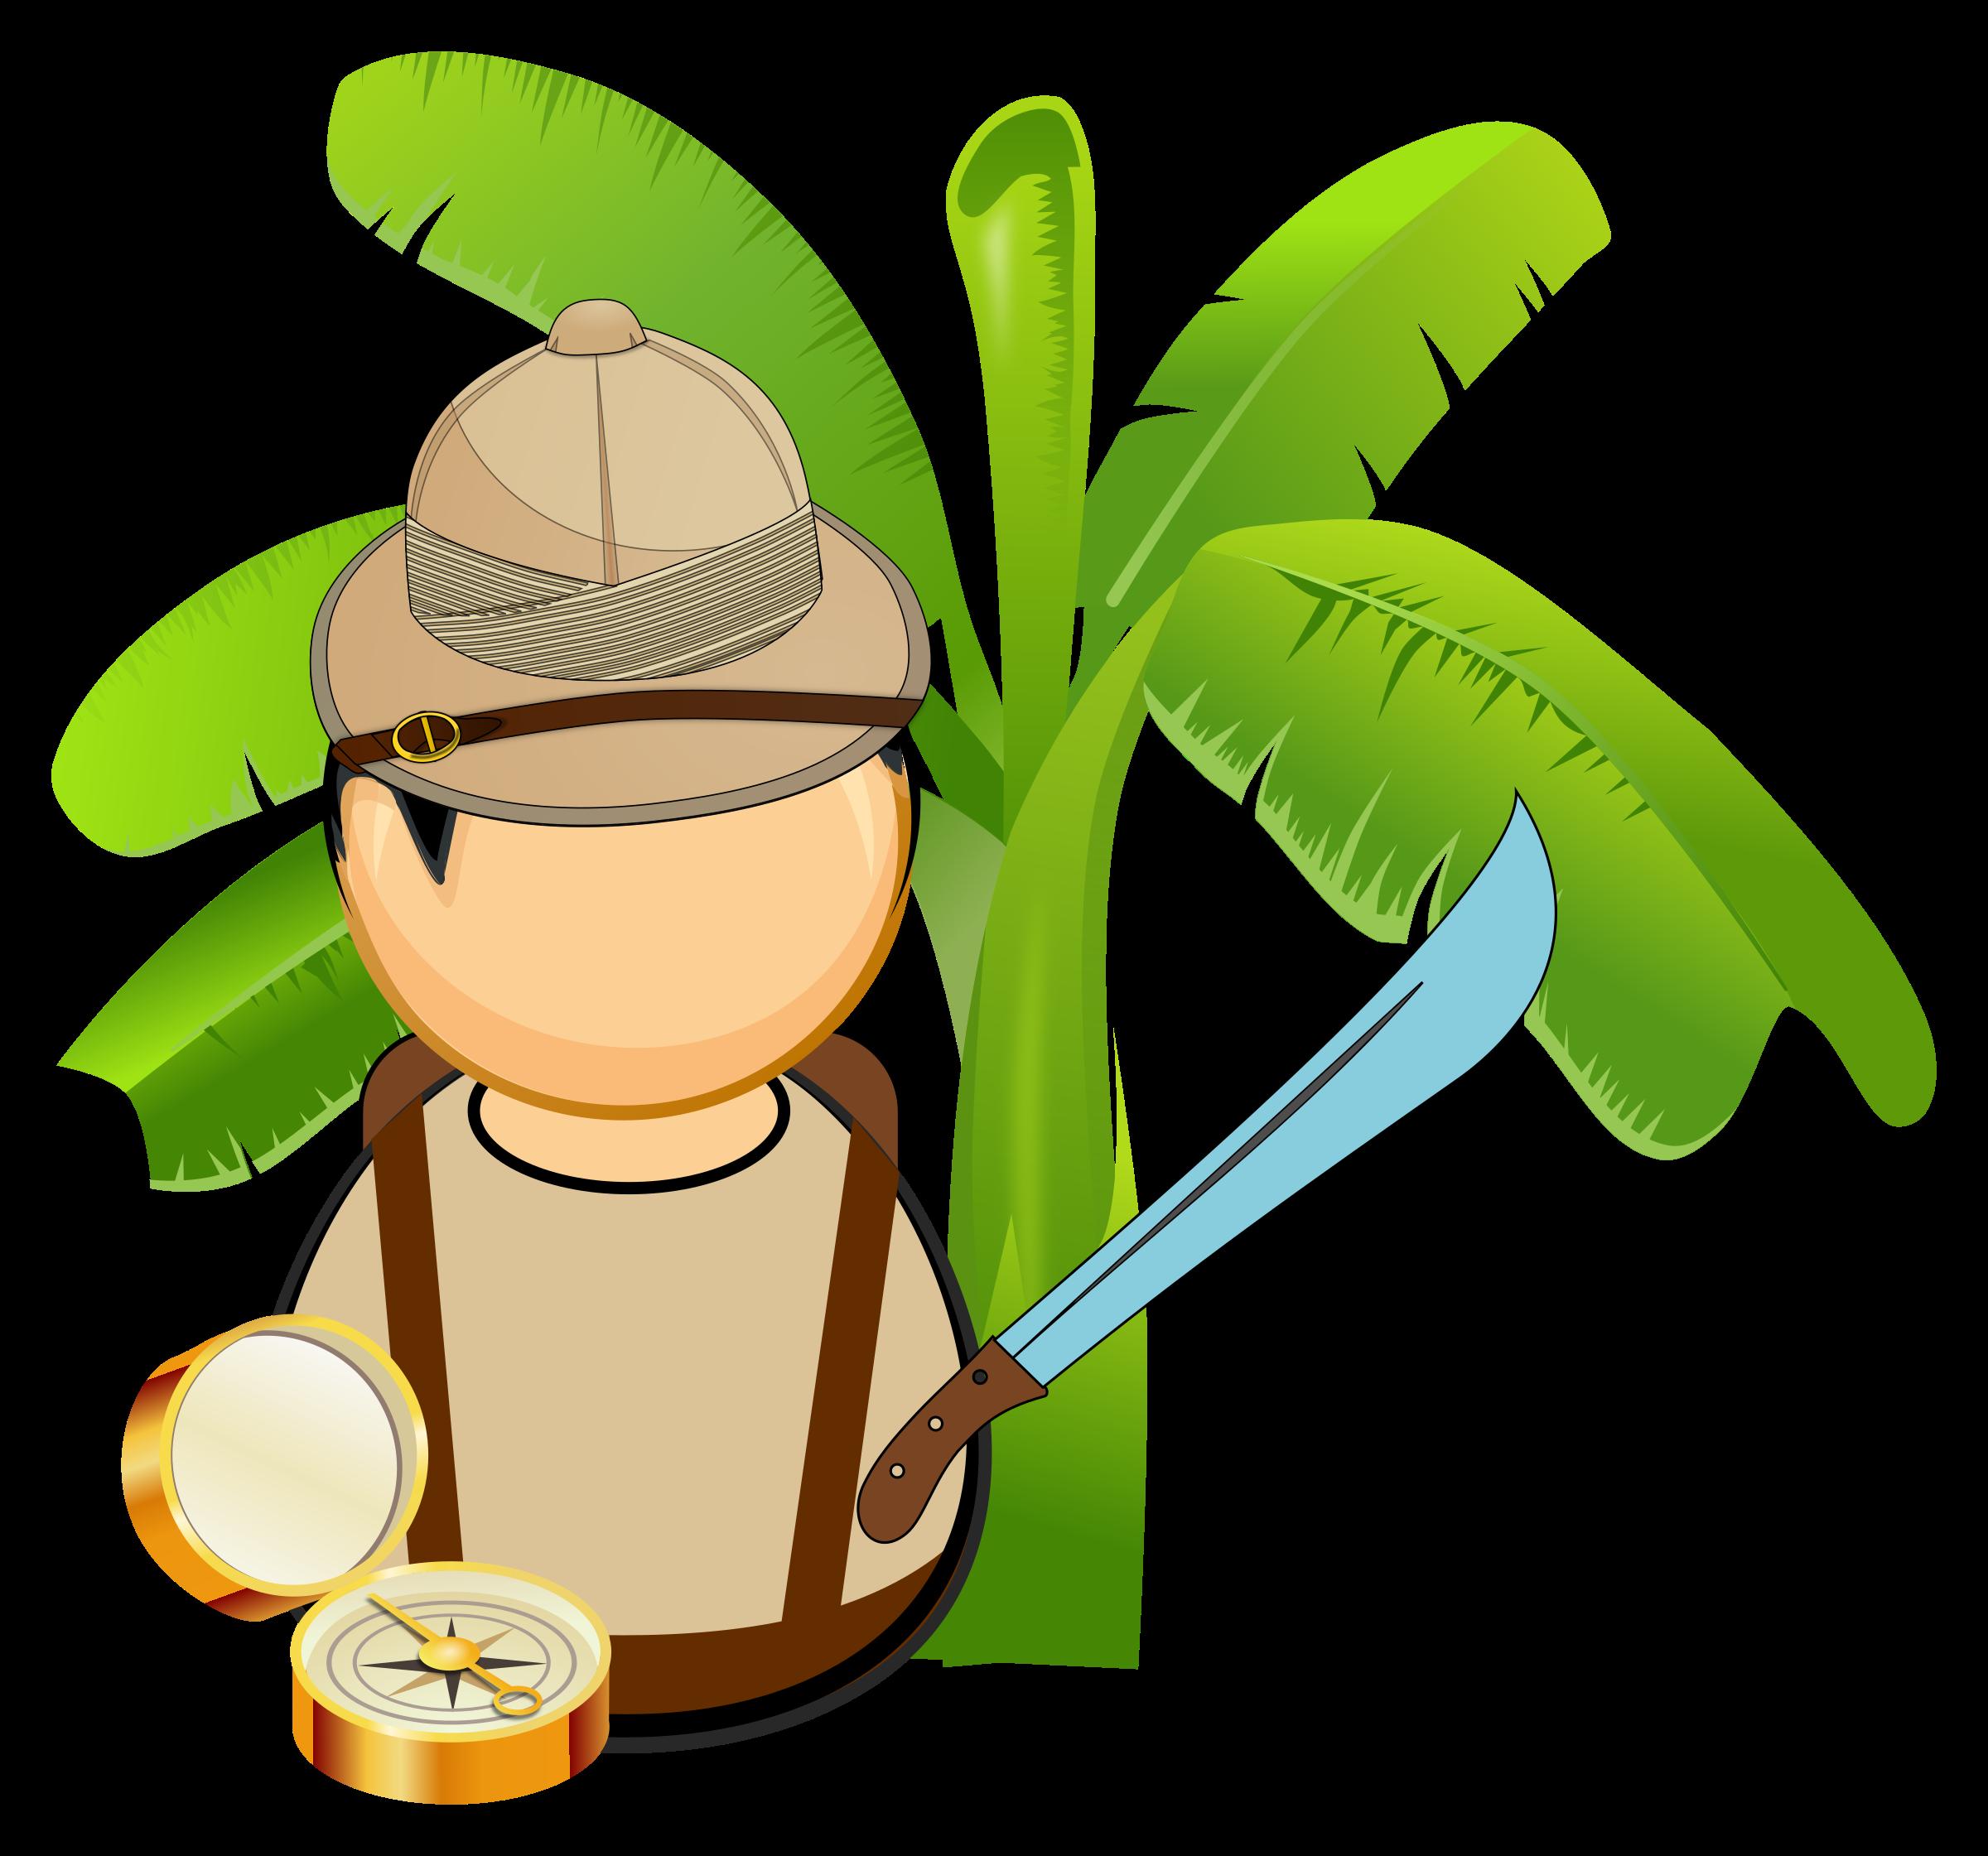 Explorer clipart rainforest explorer. Who are you investor